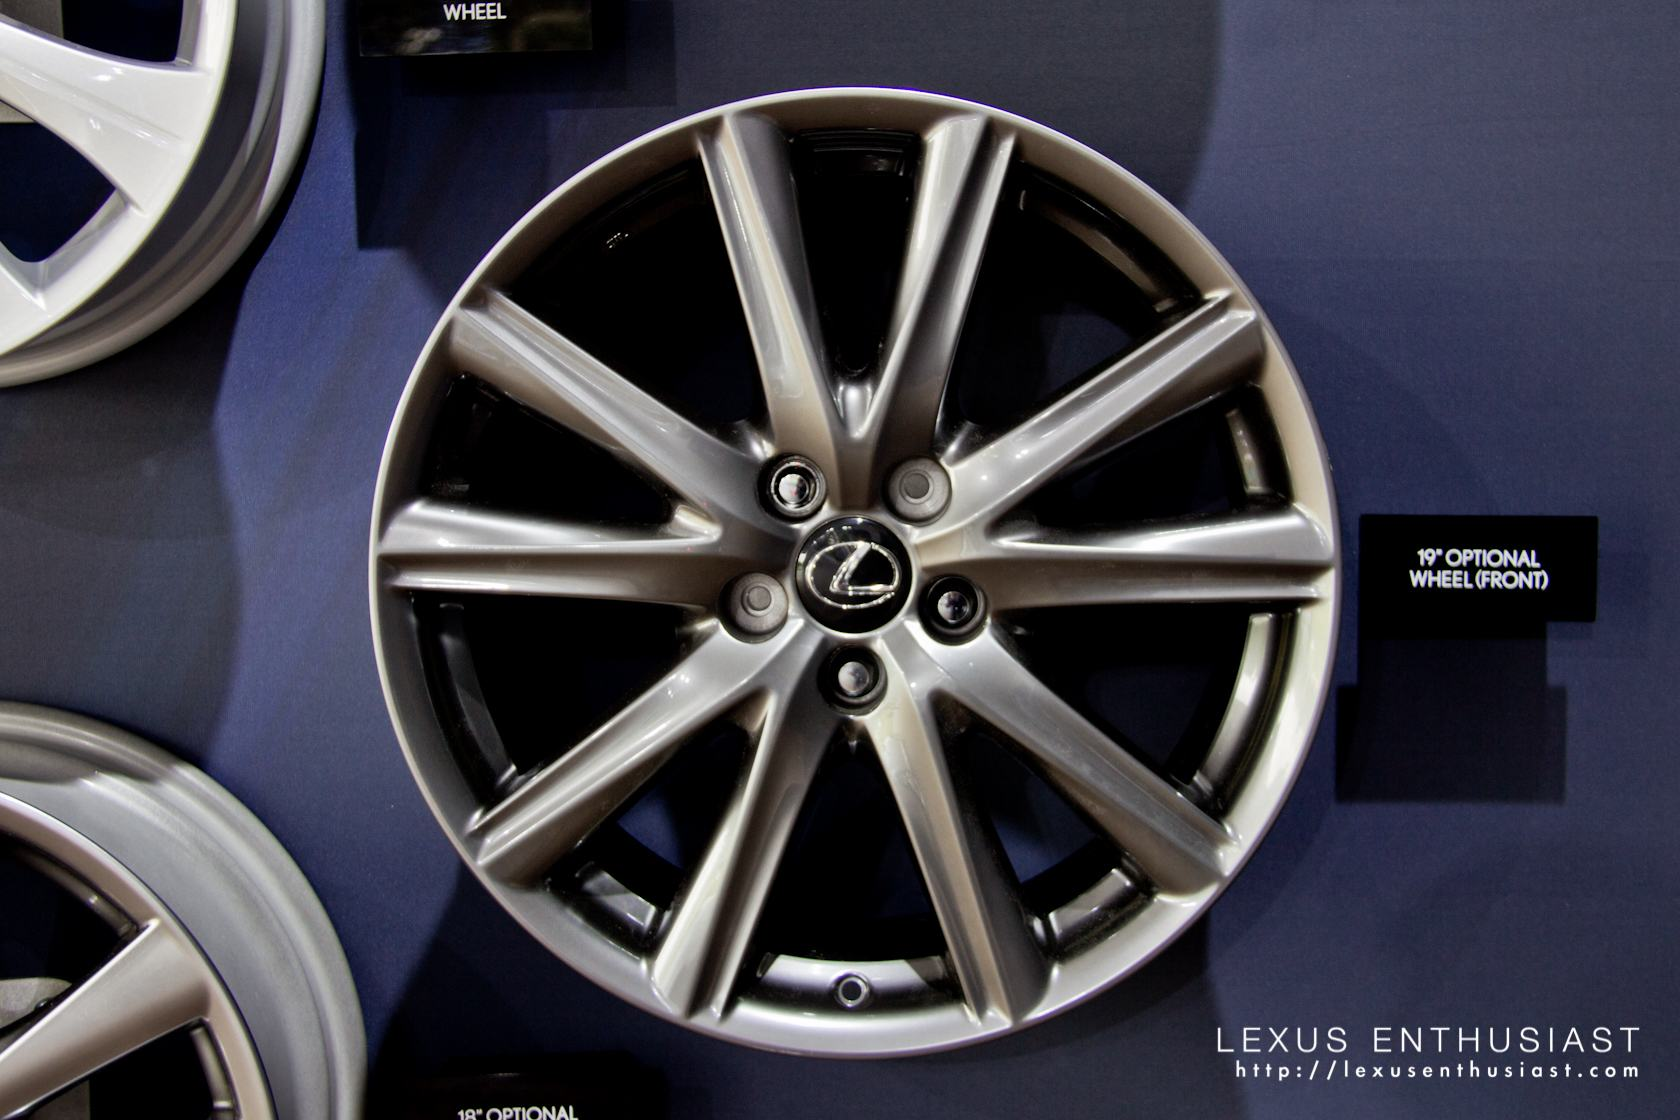 2013 Lexus GS 19 Inch Optional Wheel